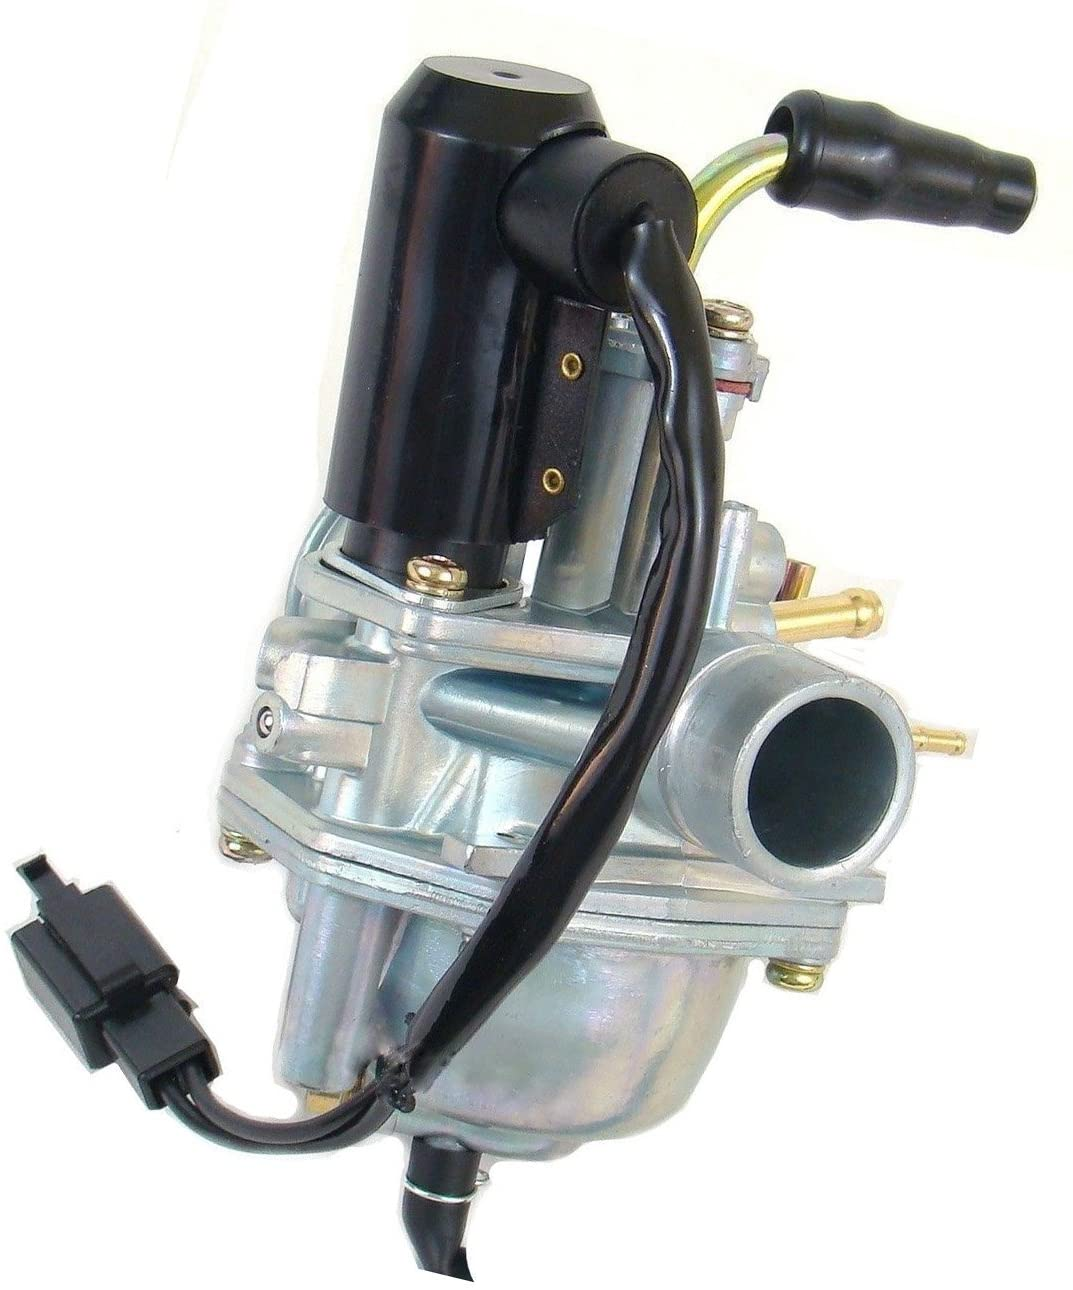 Carburetor for Polaris ATV Scrambler Sportsman 90 90cc Carb